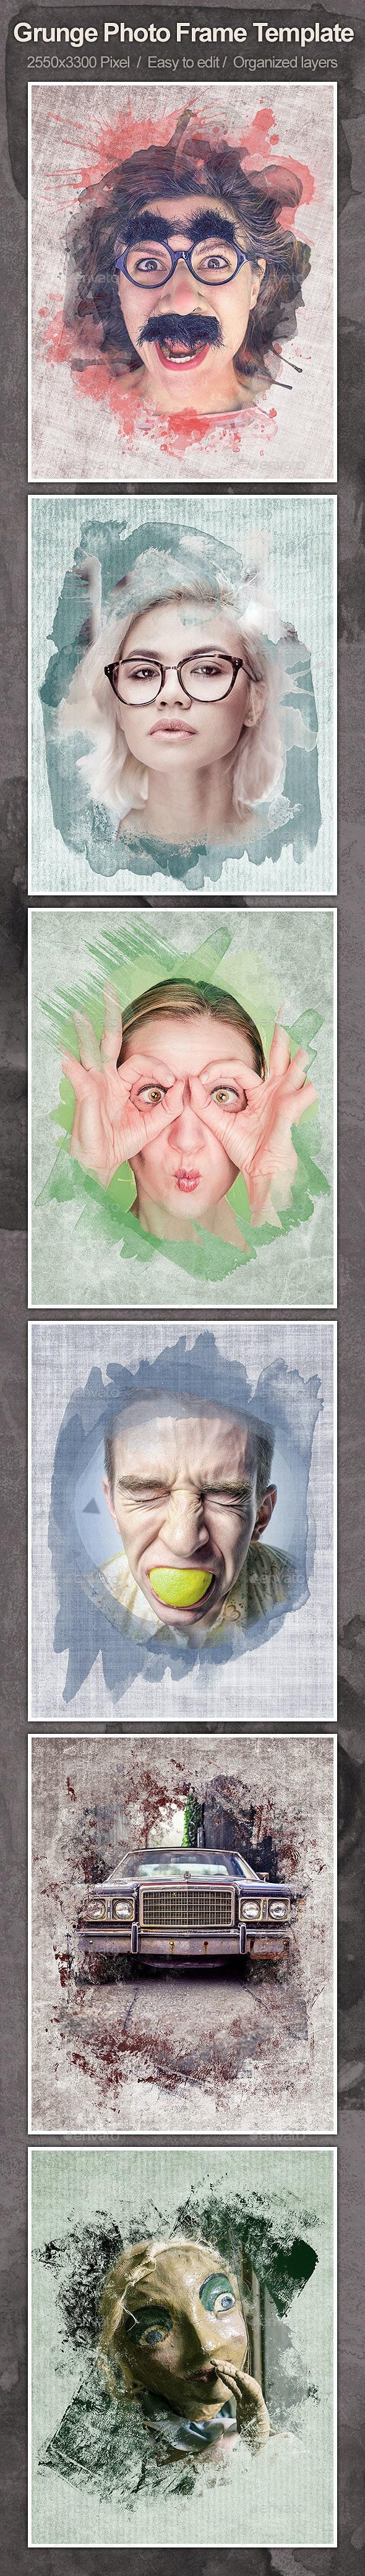 Grunge Photo Frame Template - Artistic Photo Templates